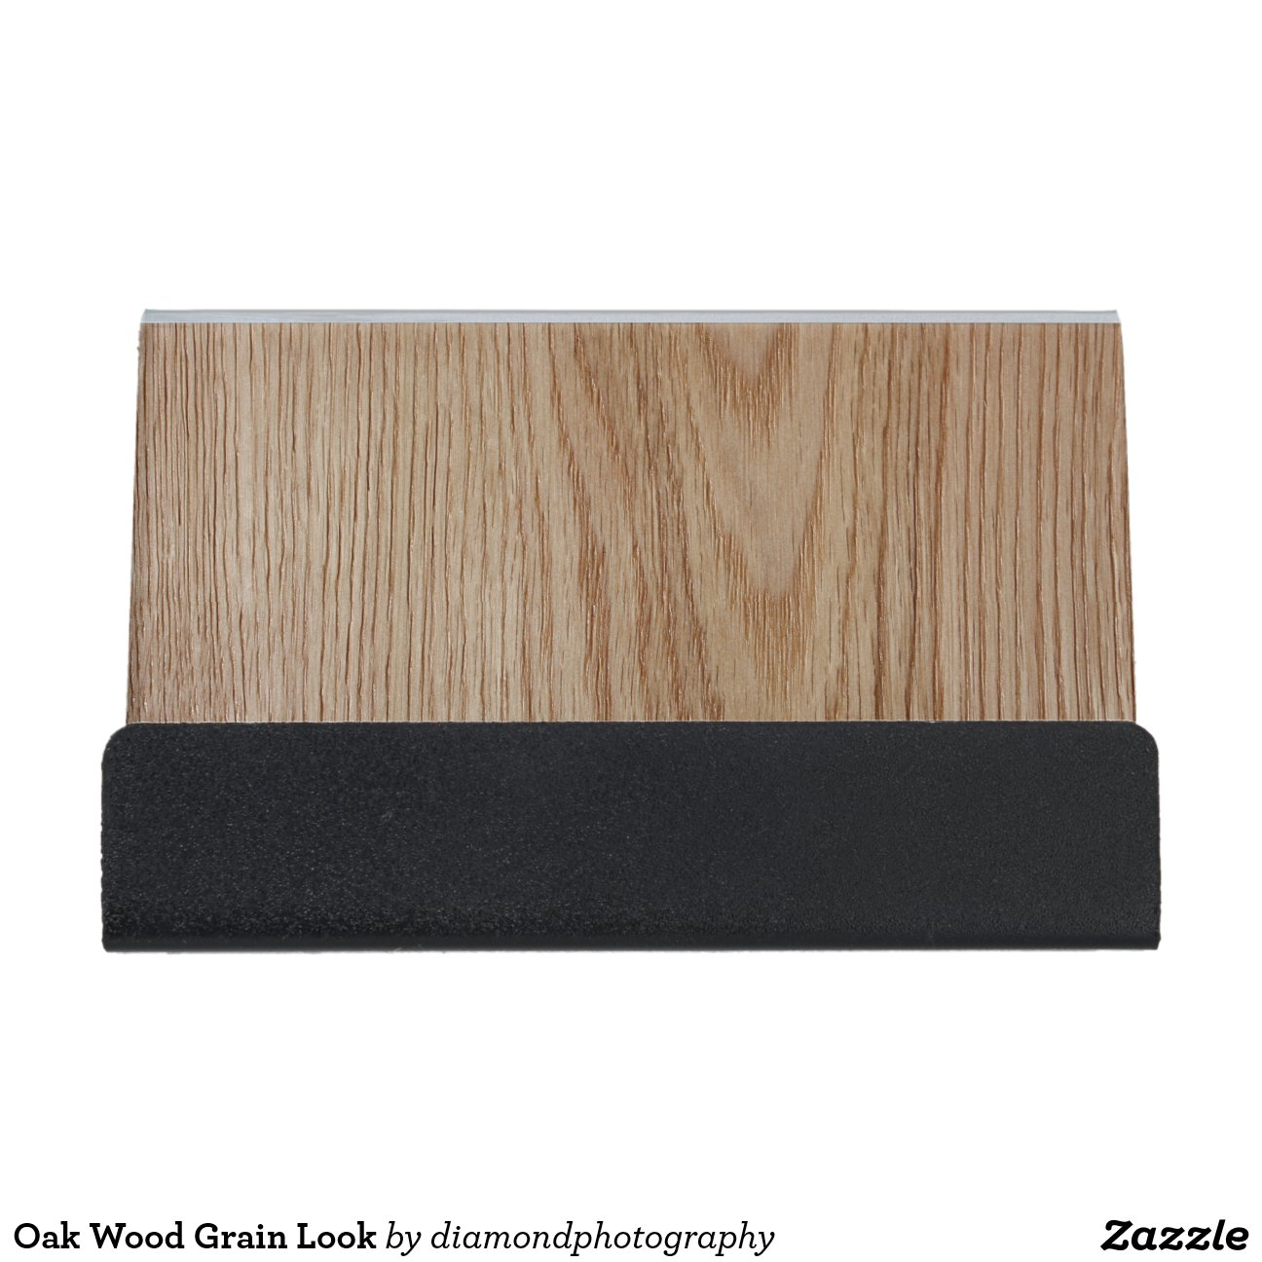 oak wood grain look desk business card holder